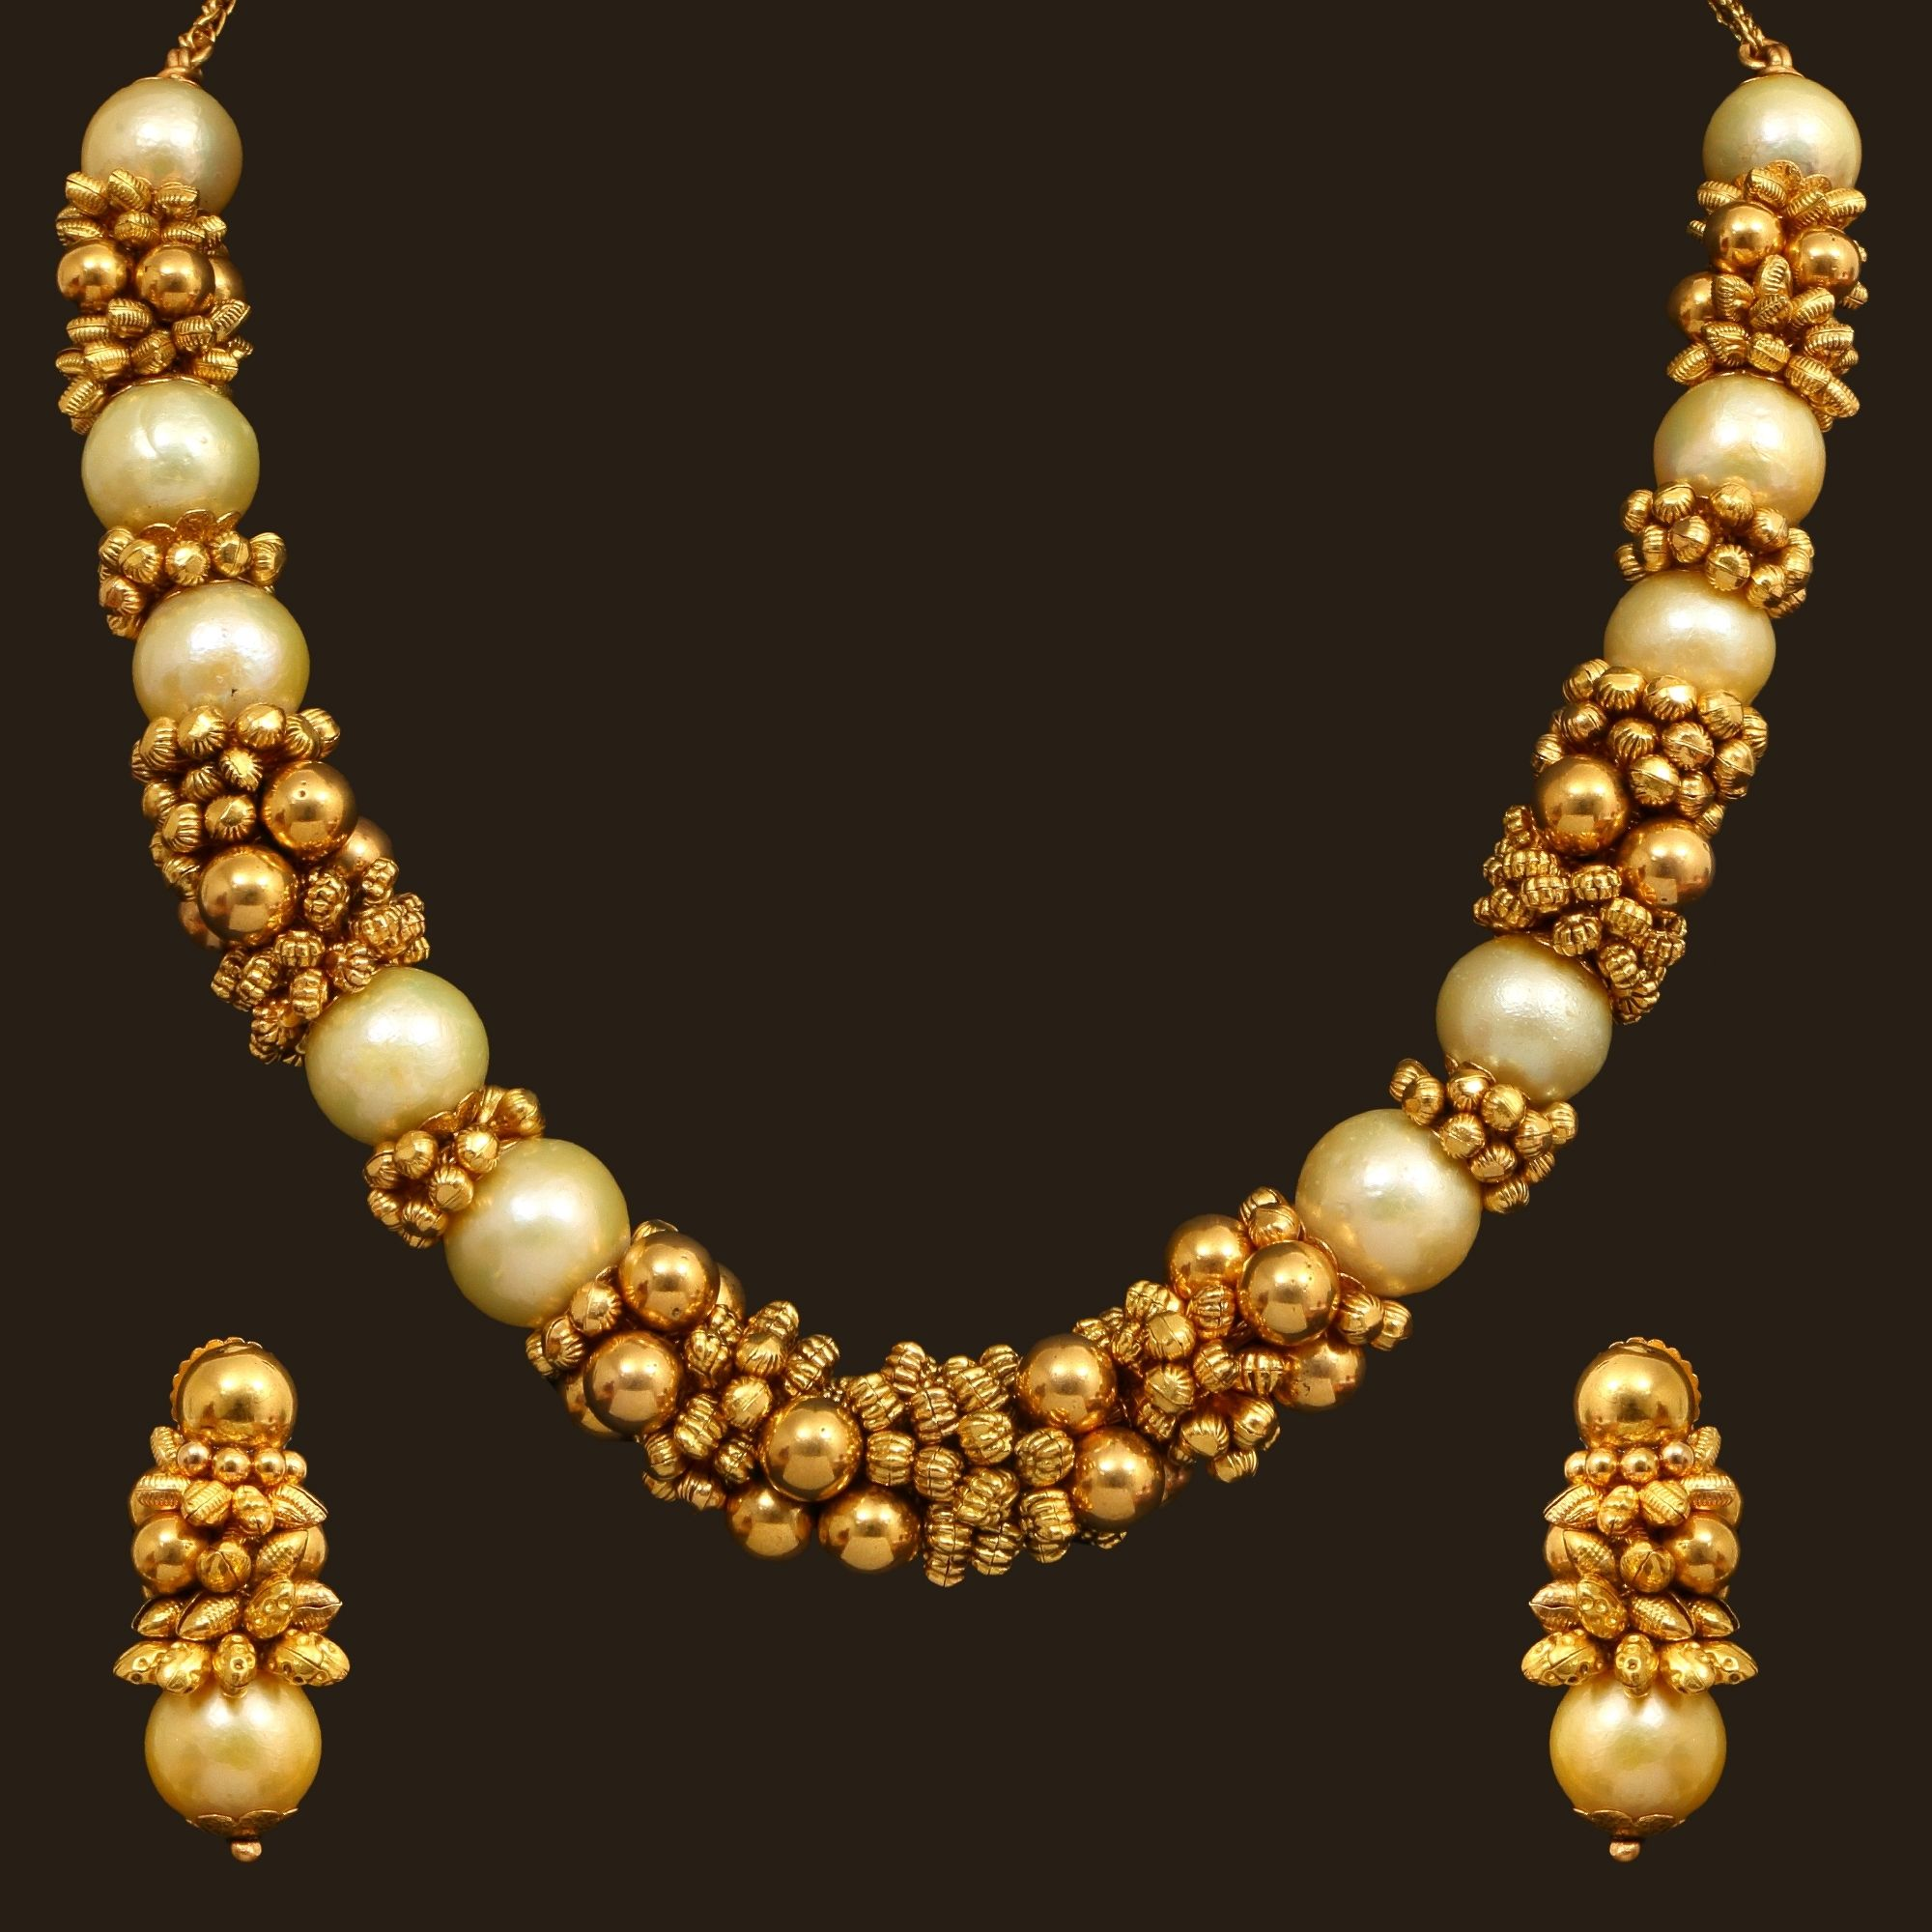 Pearl Necklace Set 110A14509108A37752  Vummidi Bangaru Jewellers  NECKLEAS S  Jewelry